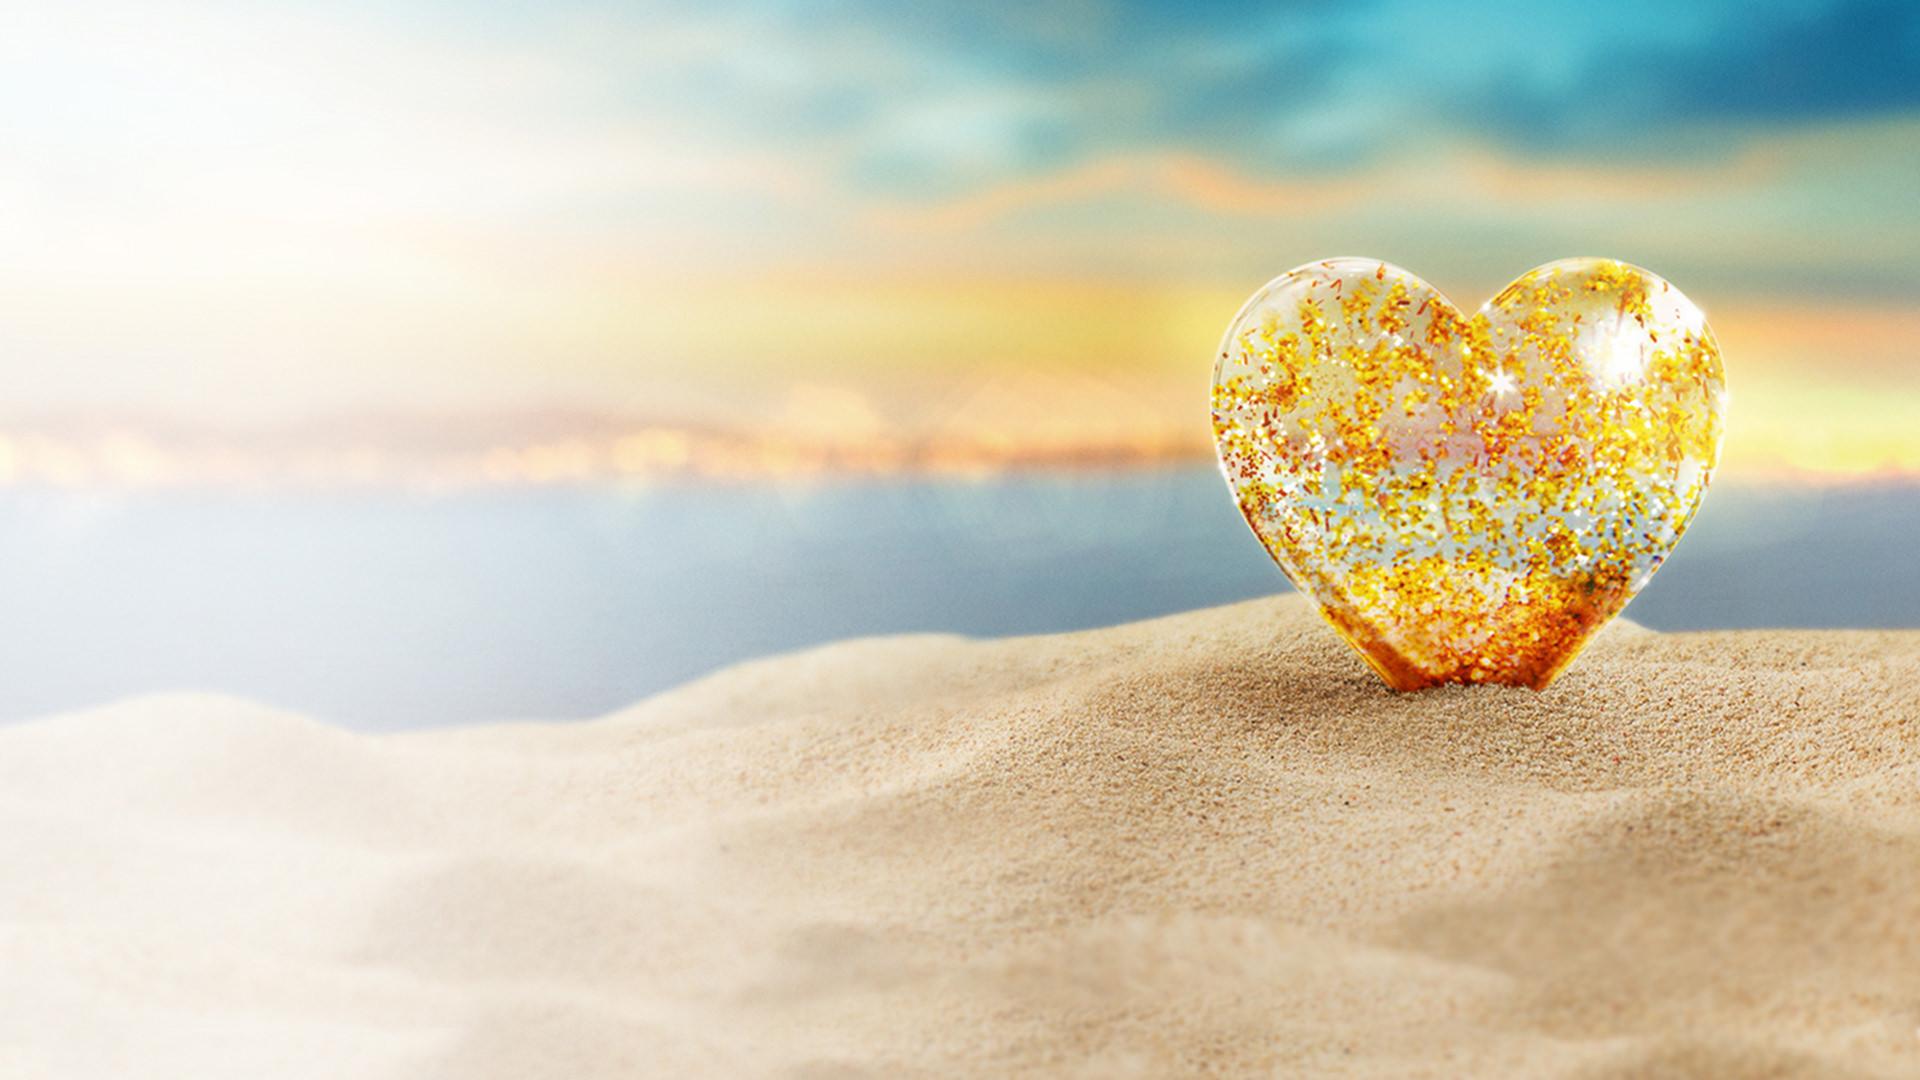 Love Island sandy beach with golden heart